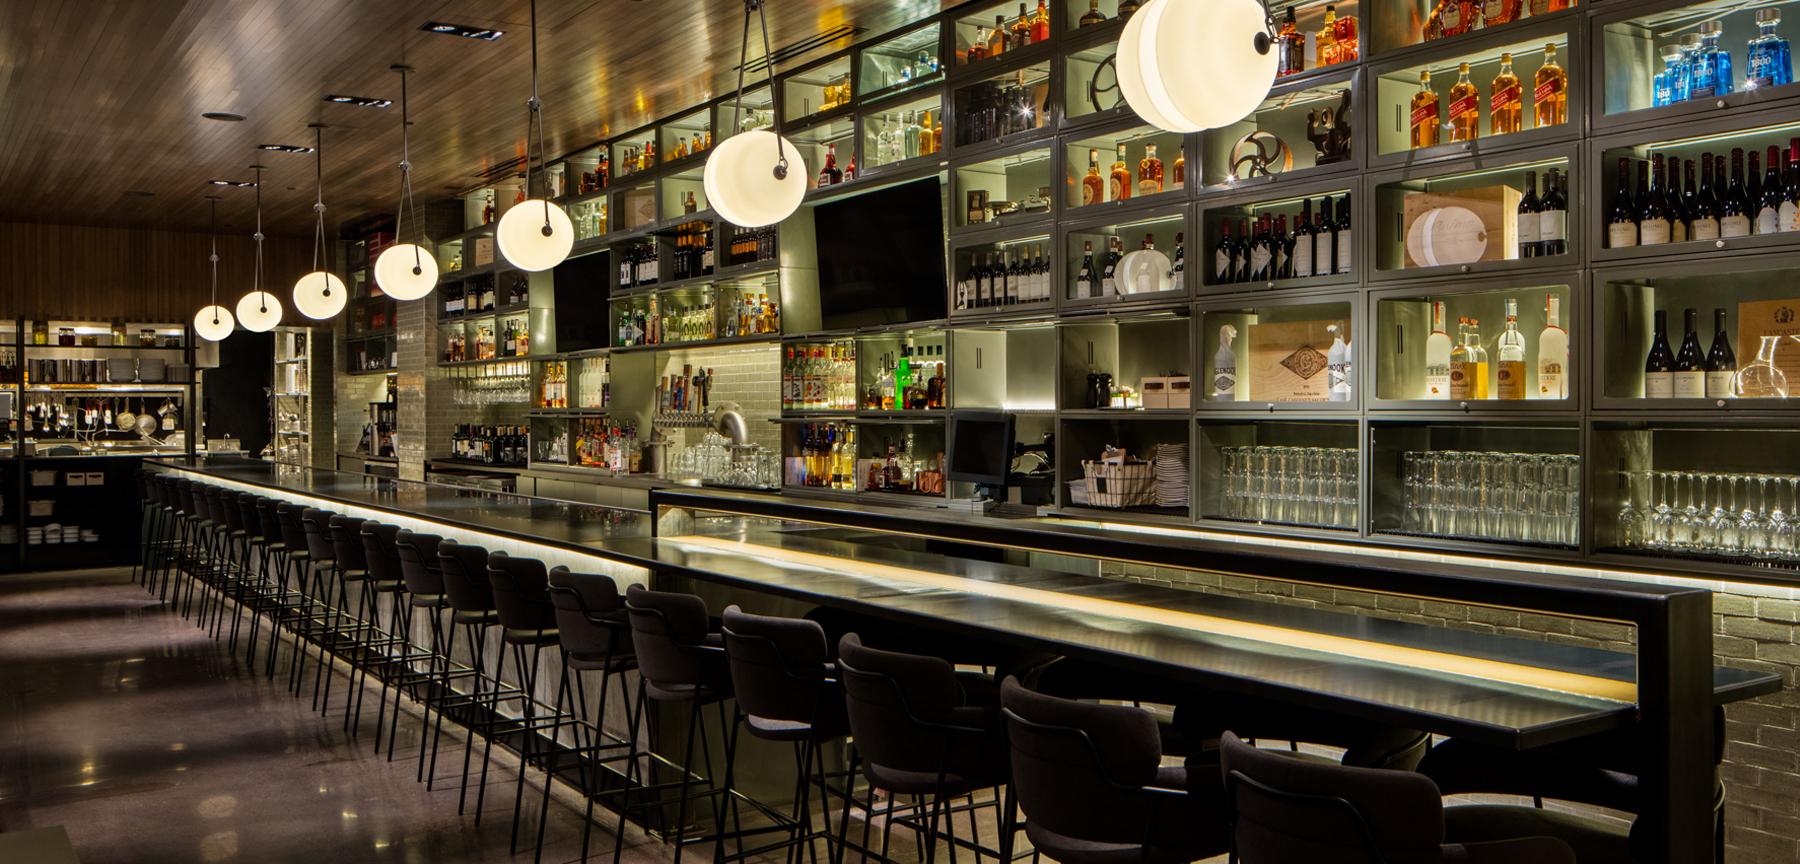 Tstreet Roadhouse bar